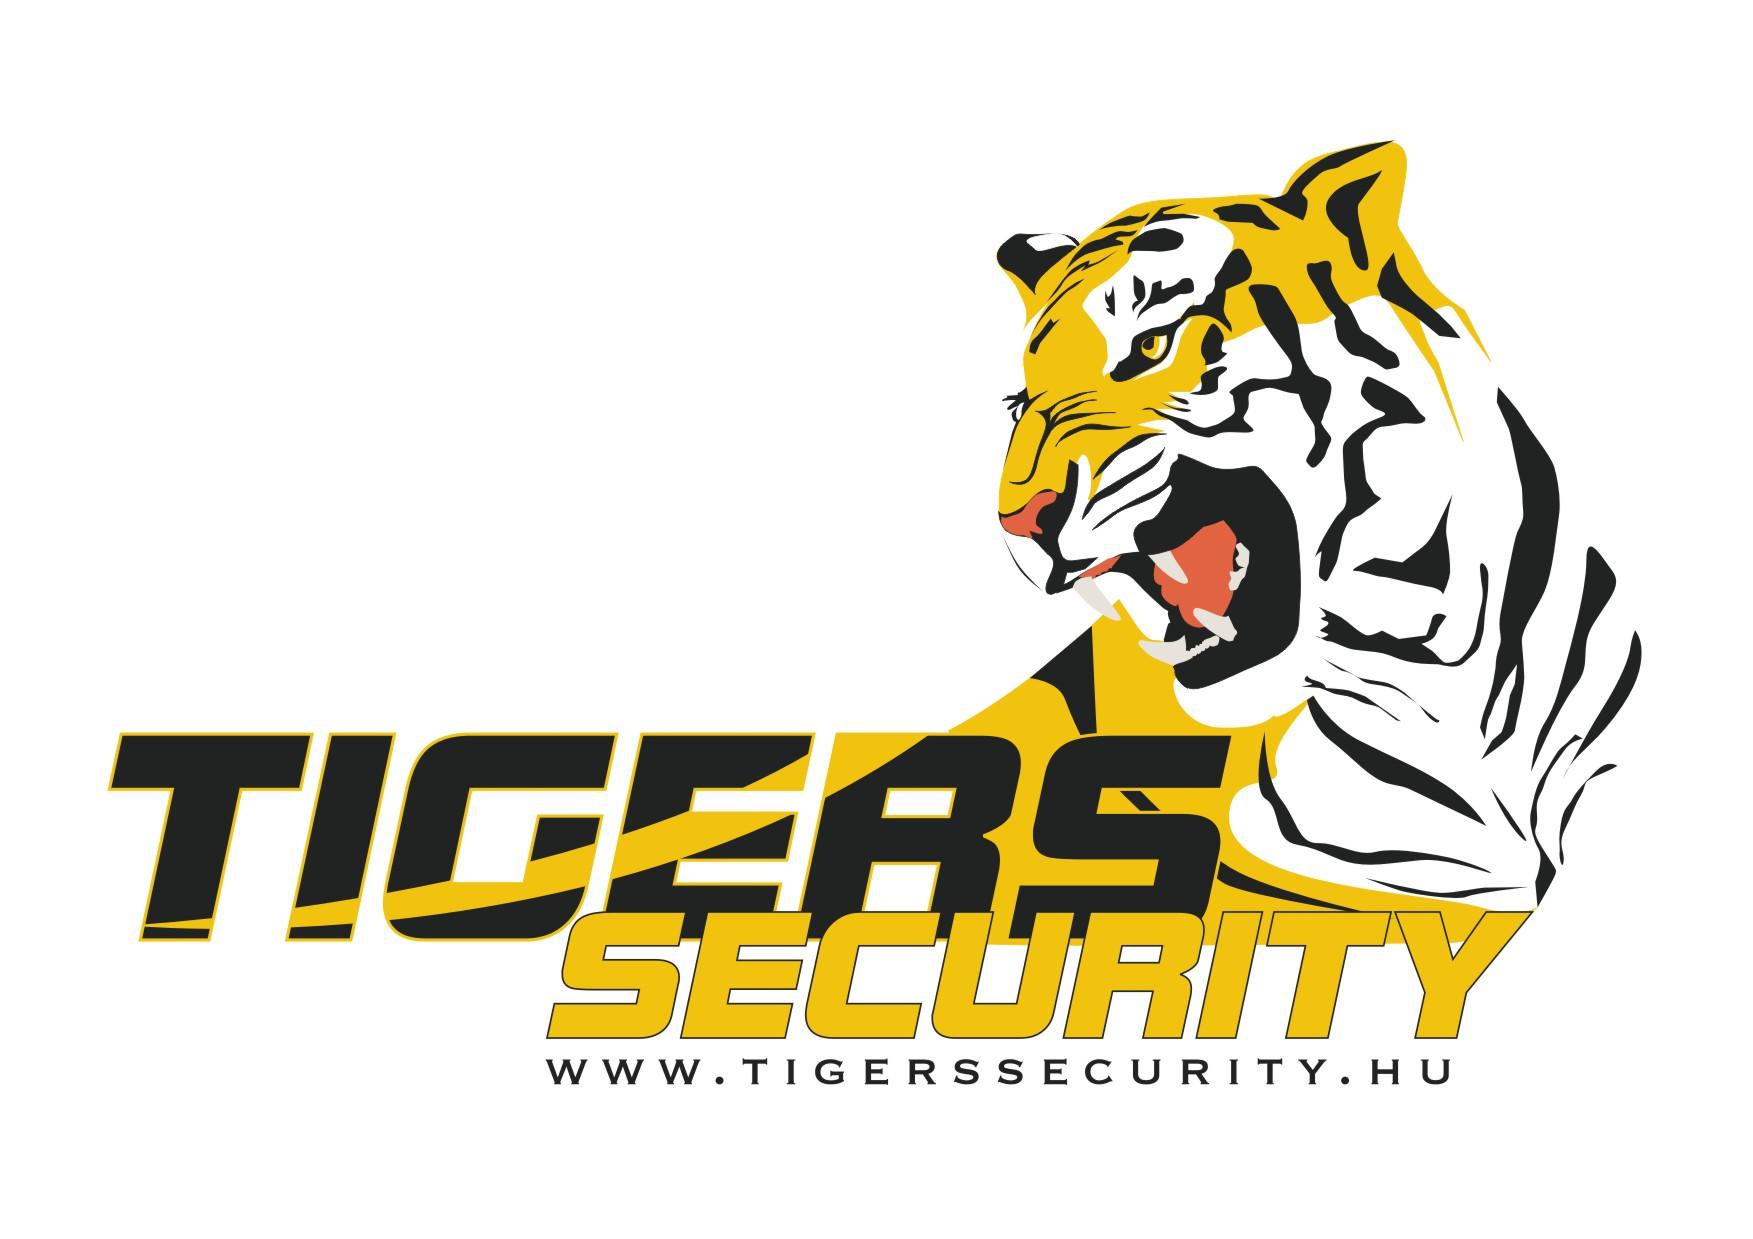 Tigers Security